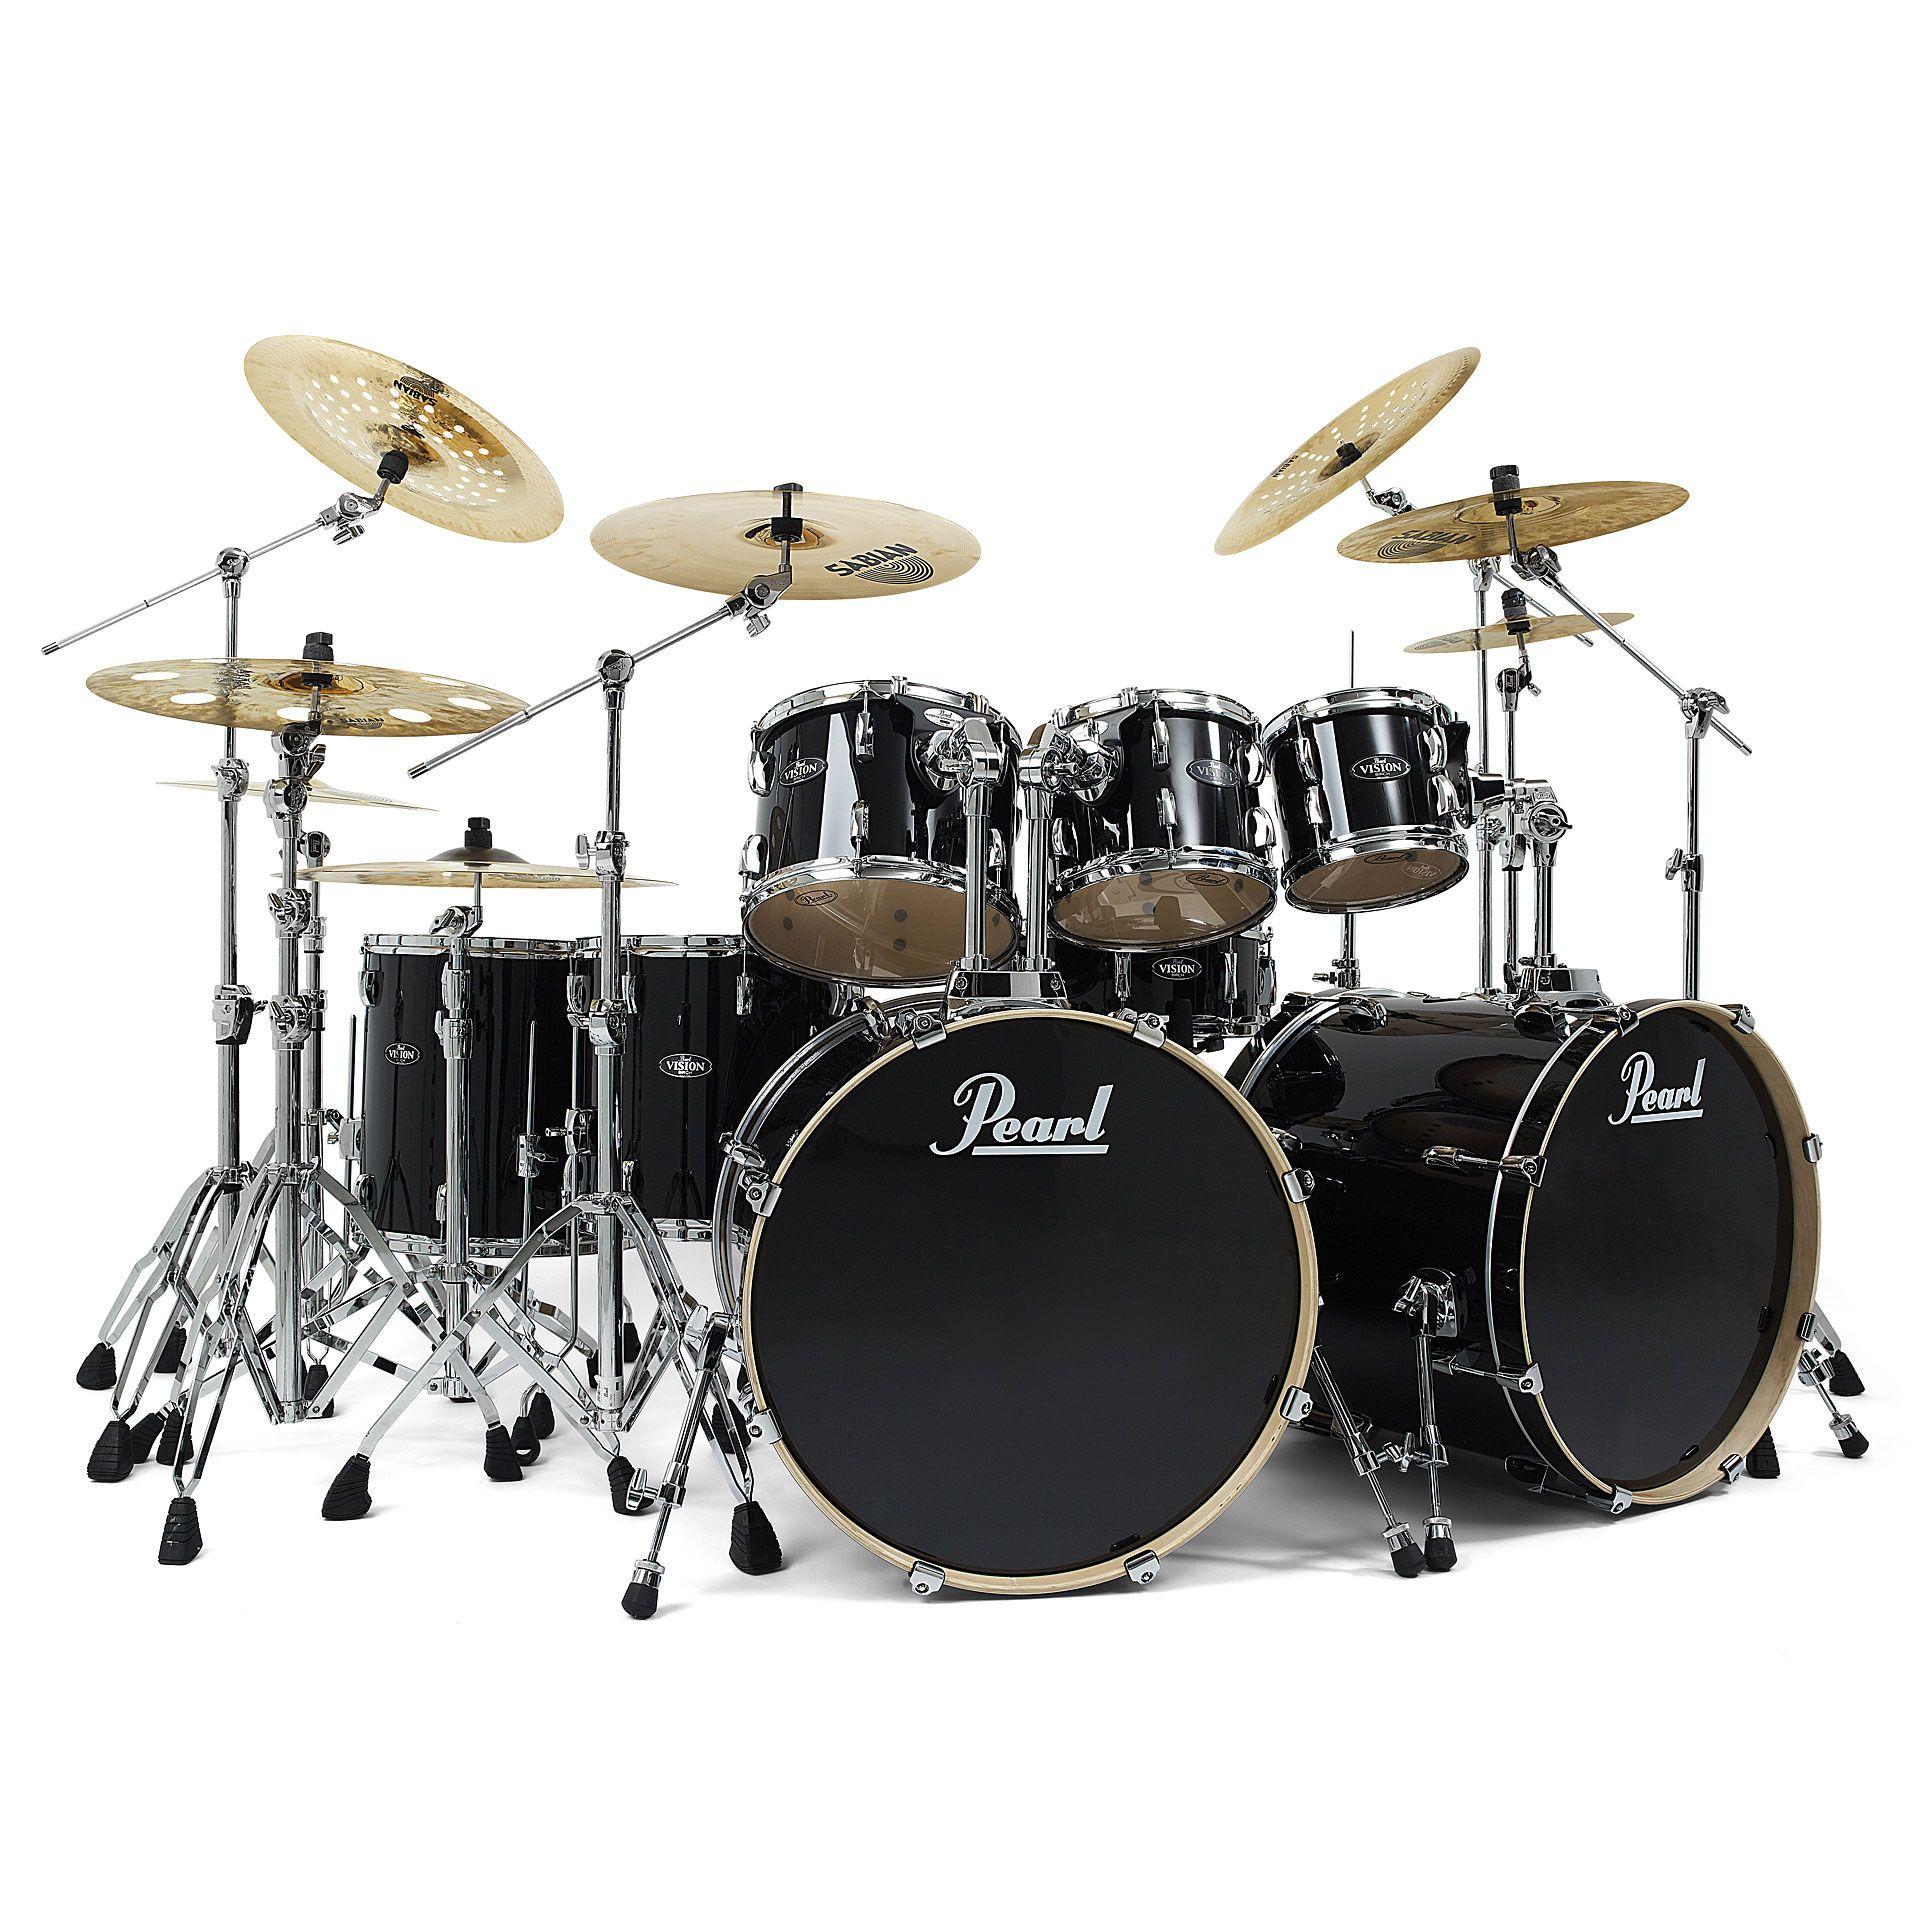 Pin by arto on drum studio in 2020 | Pearl drums, Acoustic drum, Drums